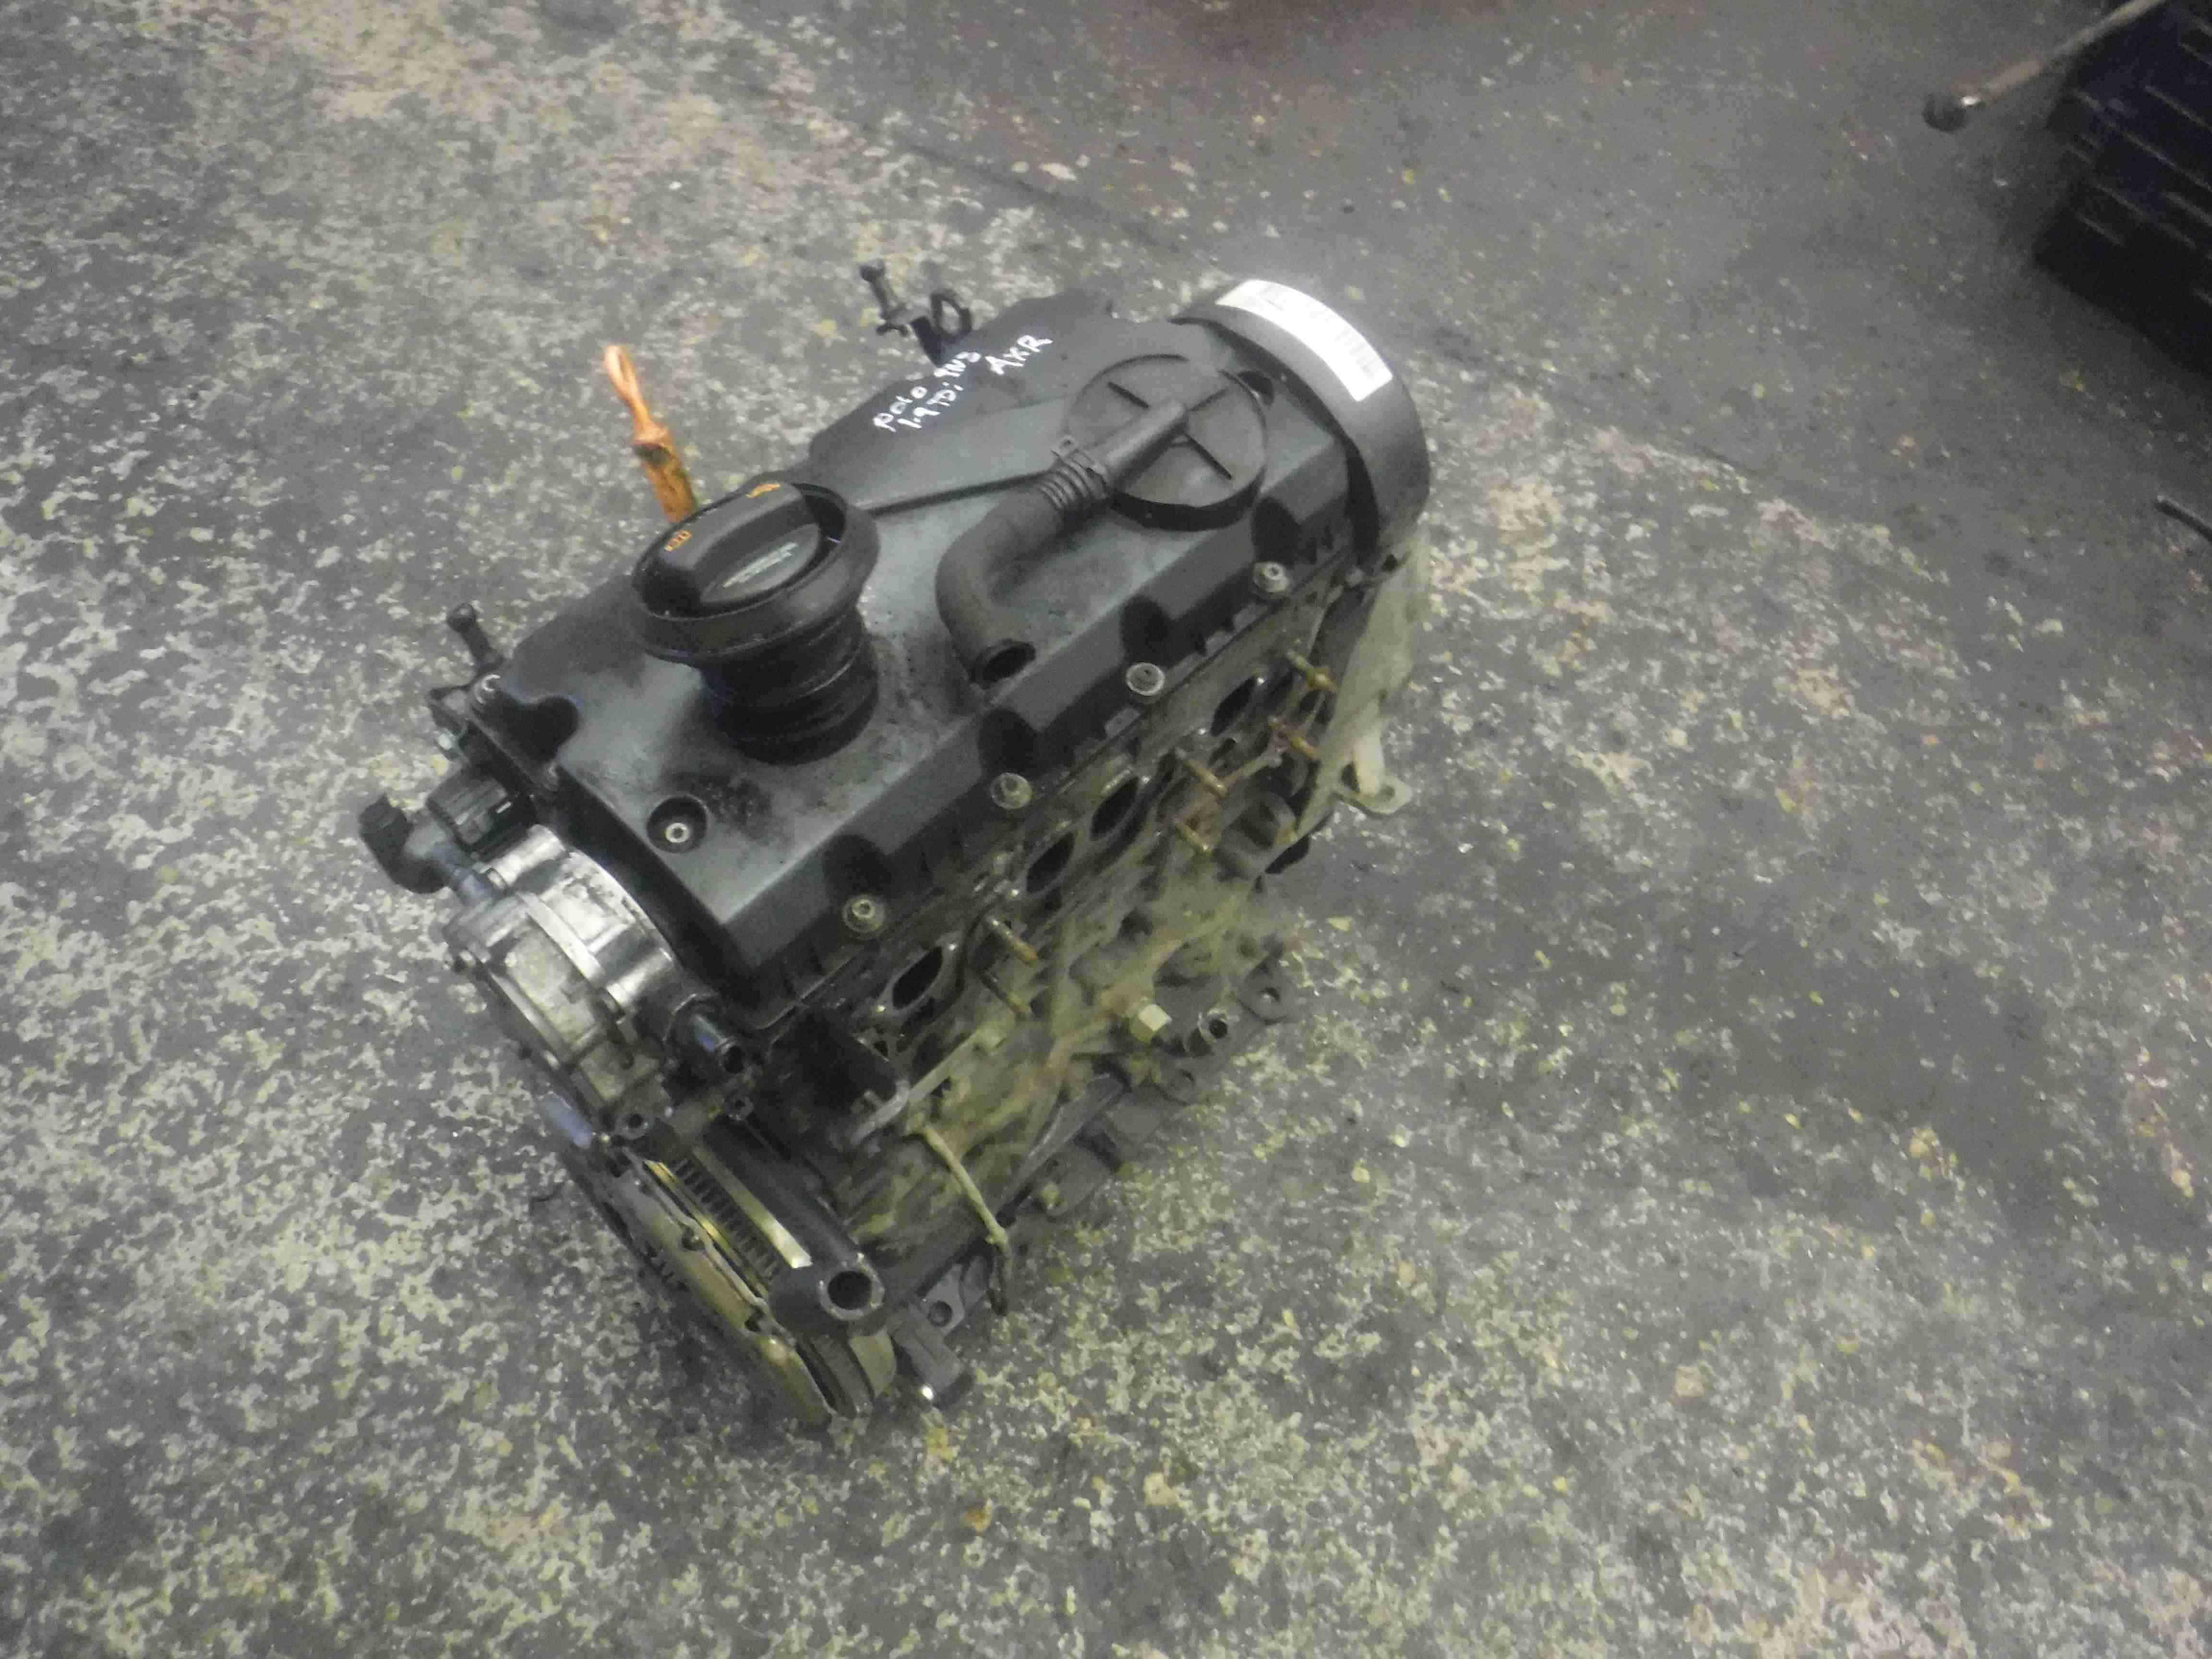 Volkswagen Beetle 9N3 2000-2006 1.9 TDi Engine AXR 3 Months Warranty